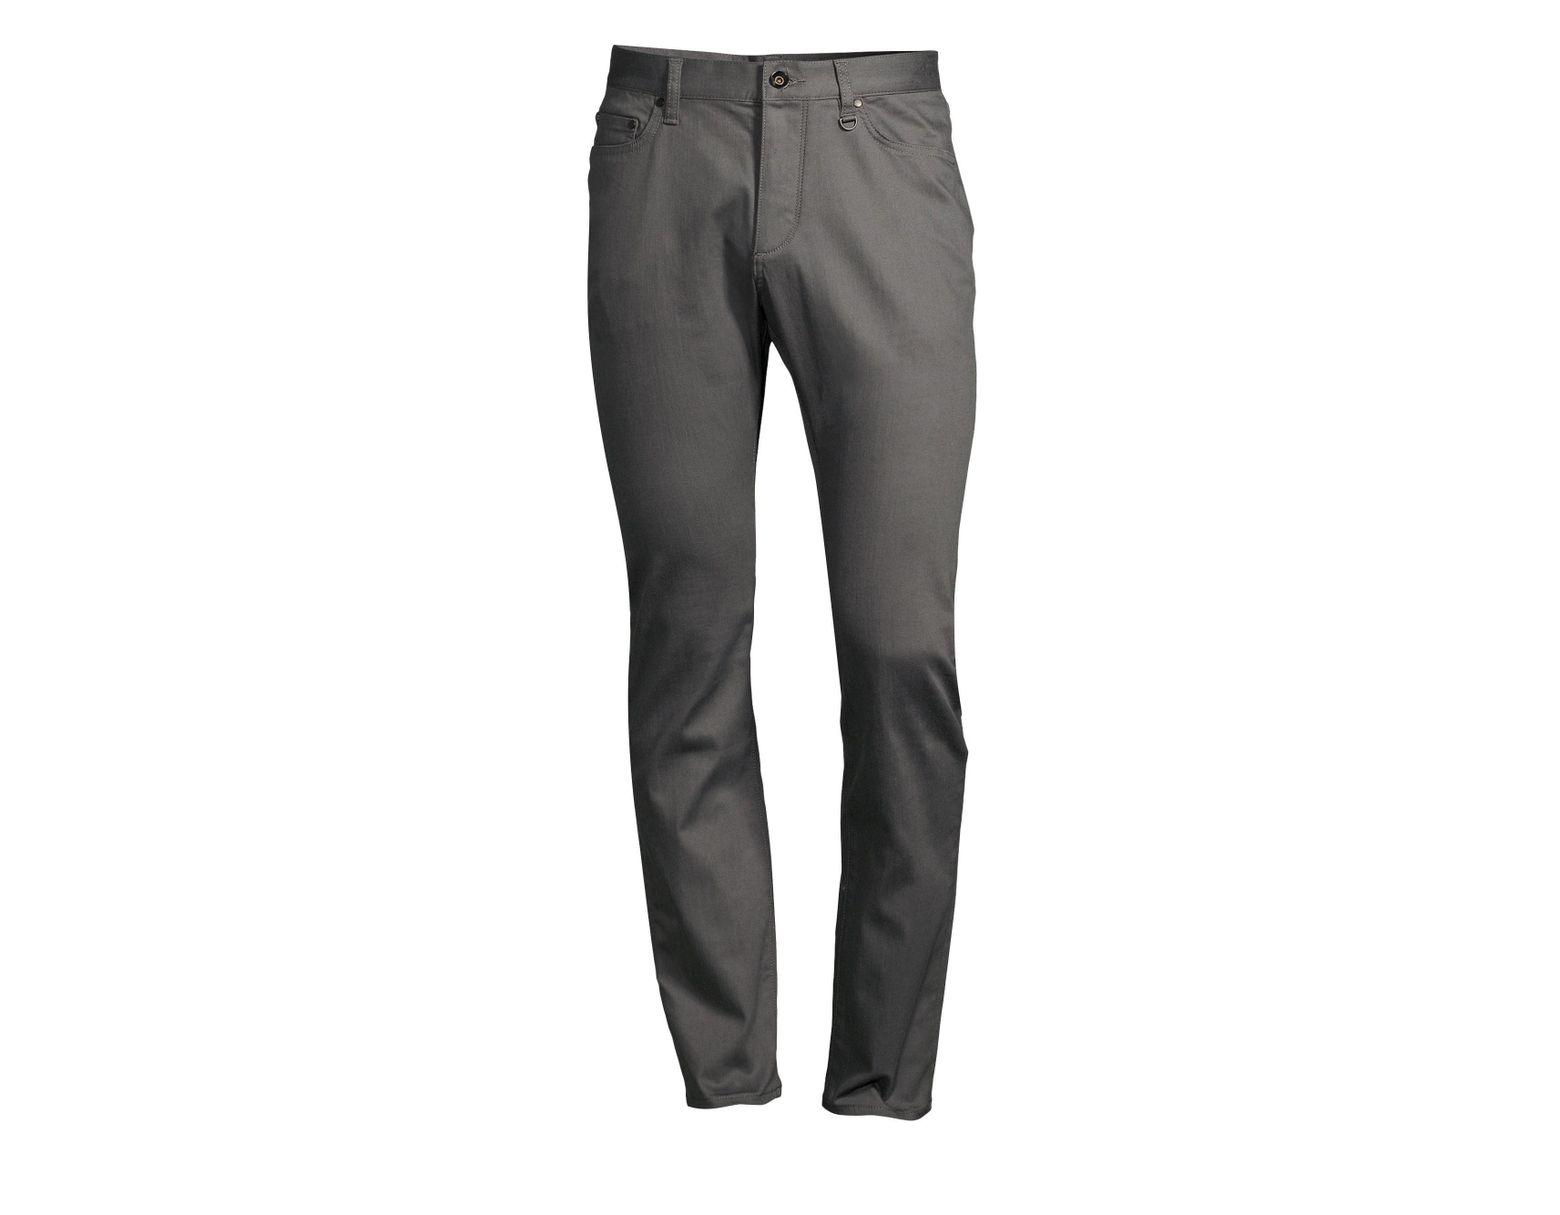 John Chelsea Jeans Steel Varvatos Men's Light Fit Grey Slim In yvnwOmPN80